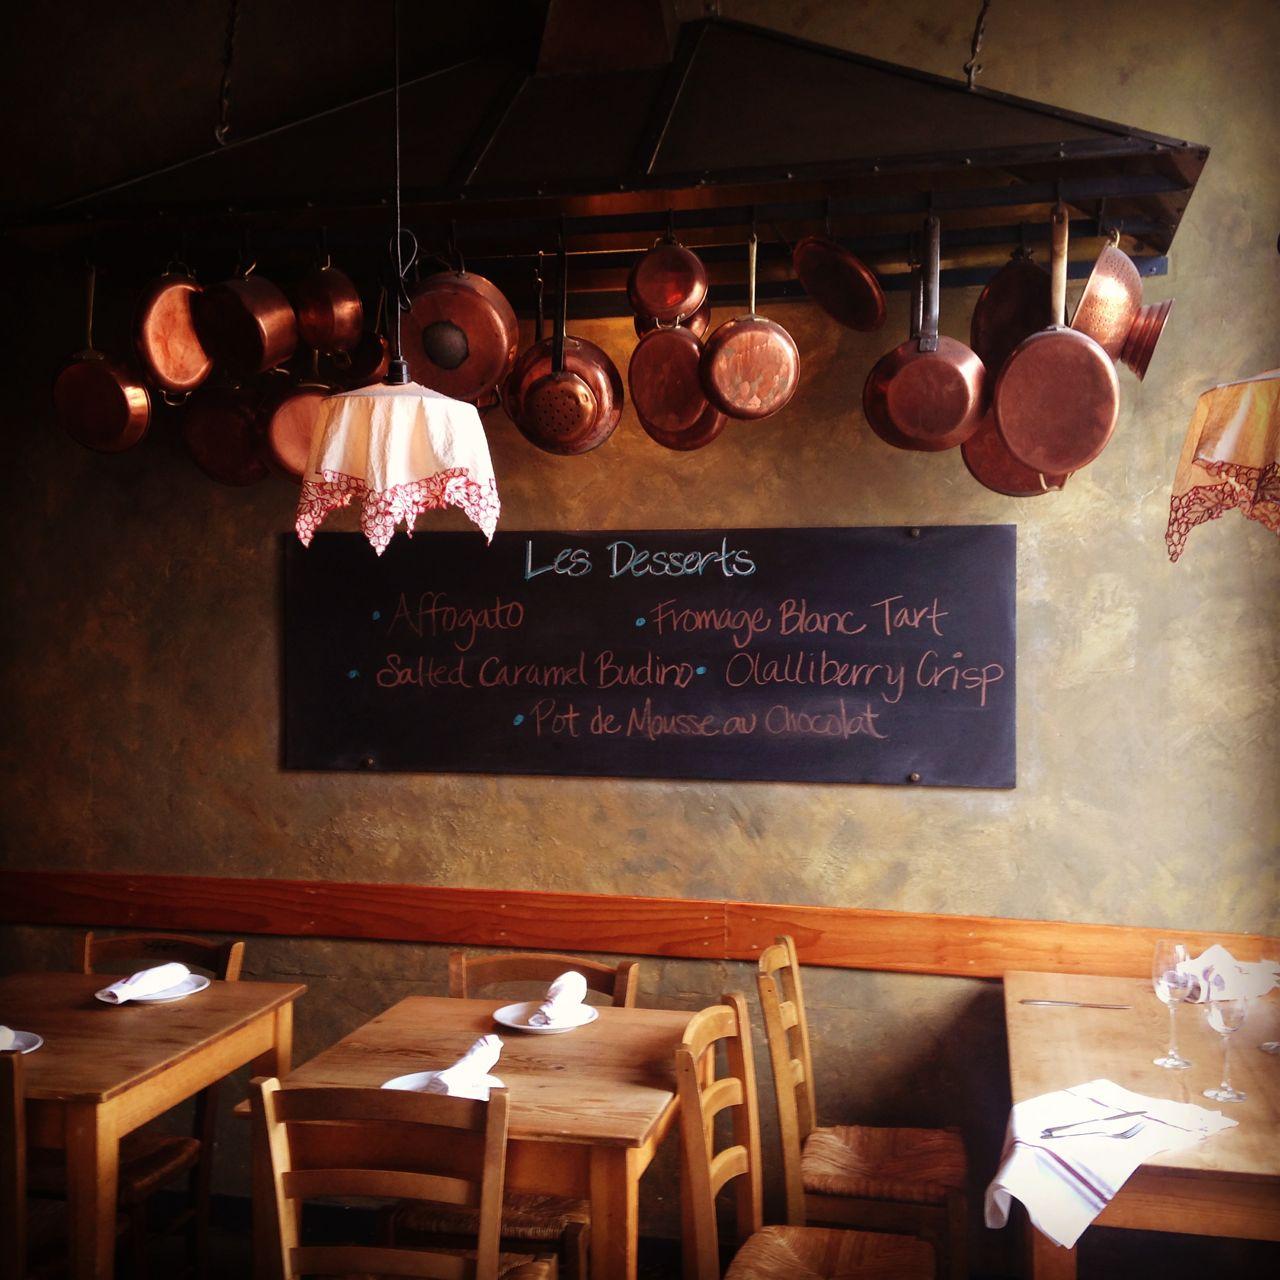 Inside of La Bicyclette restaurant